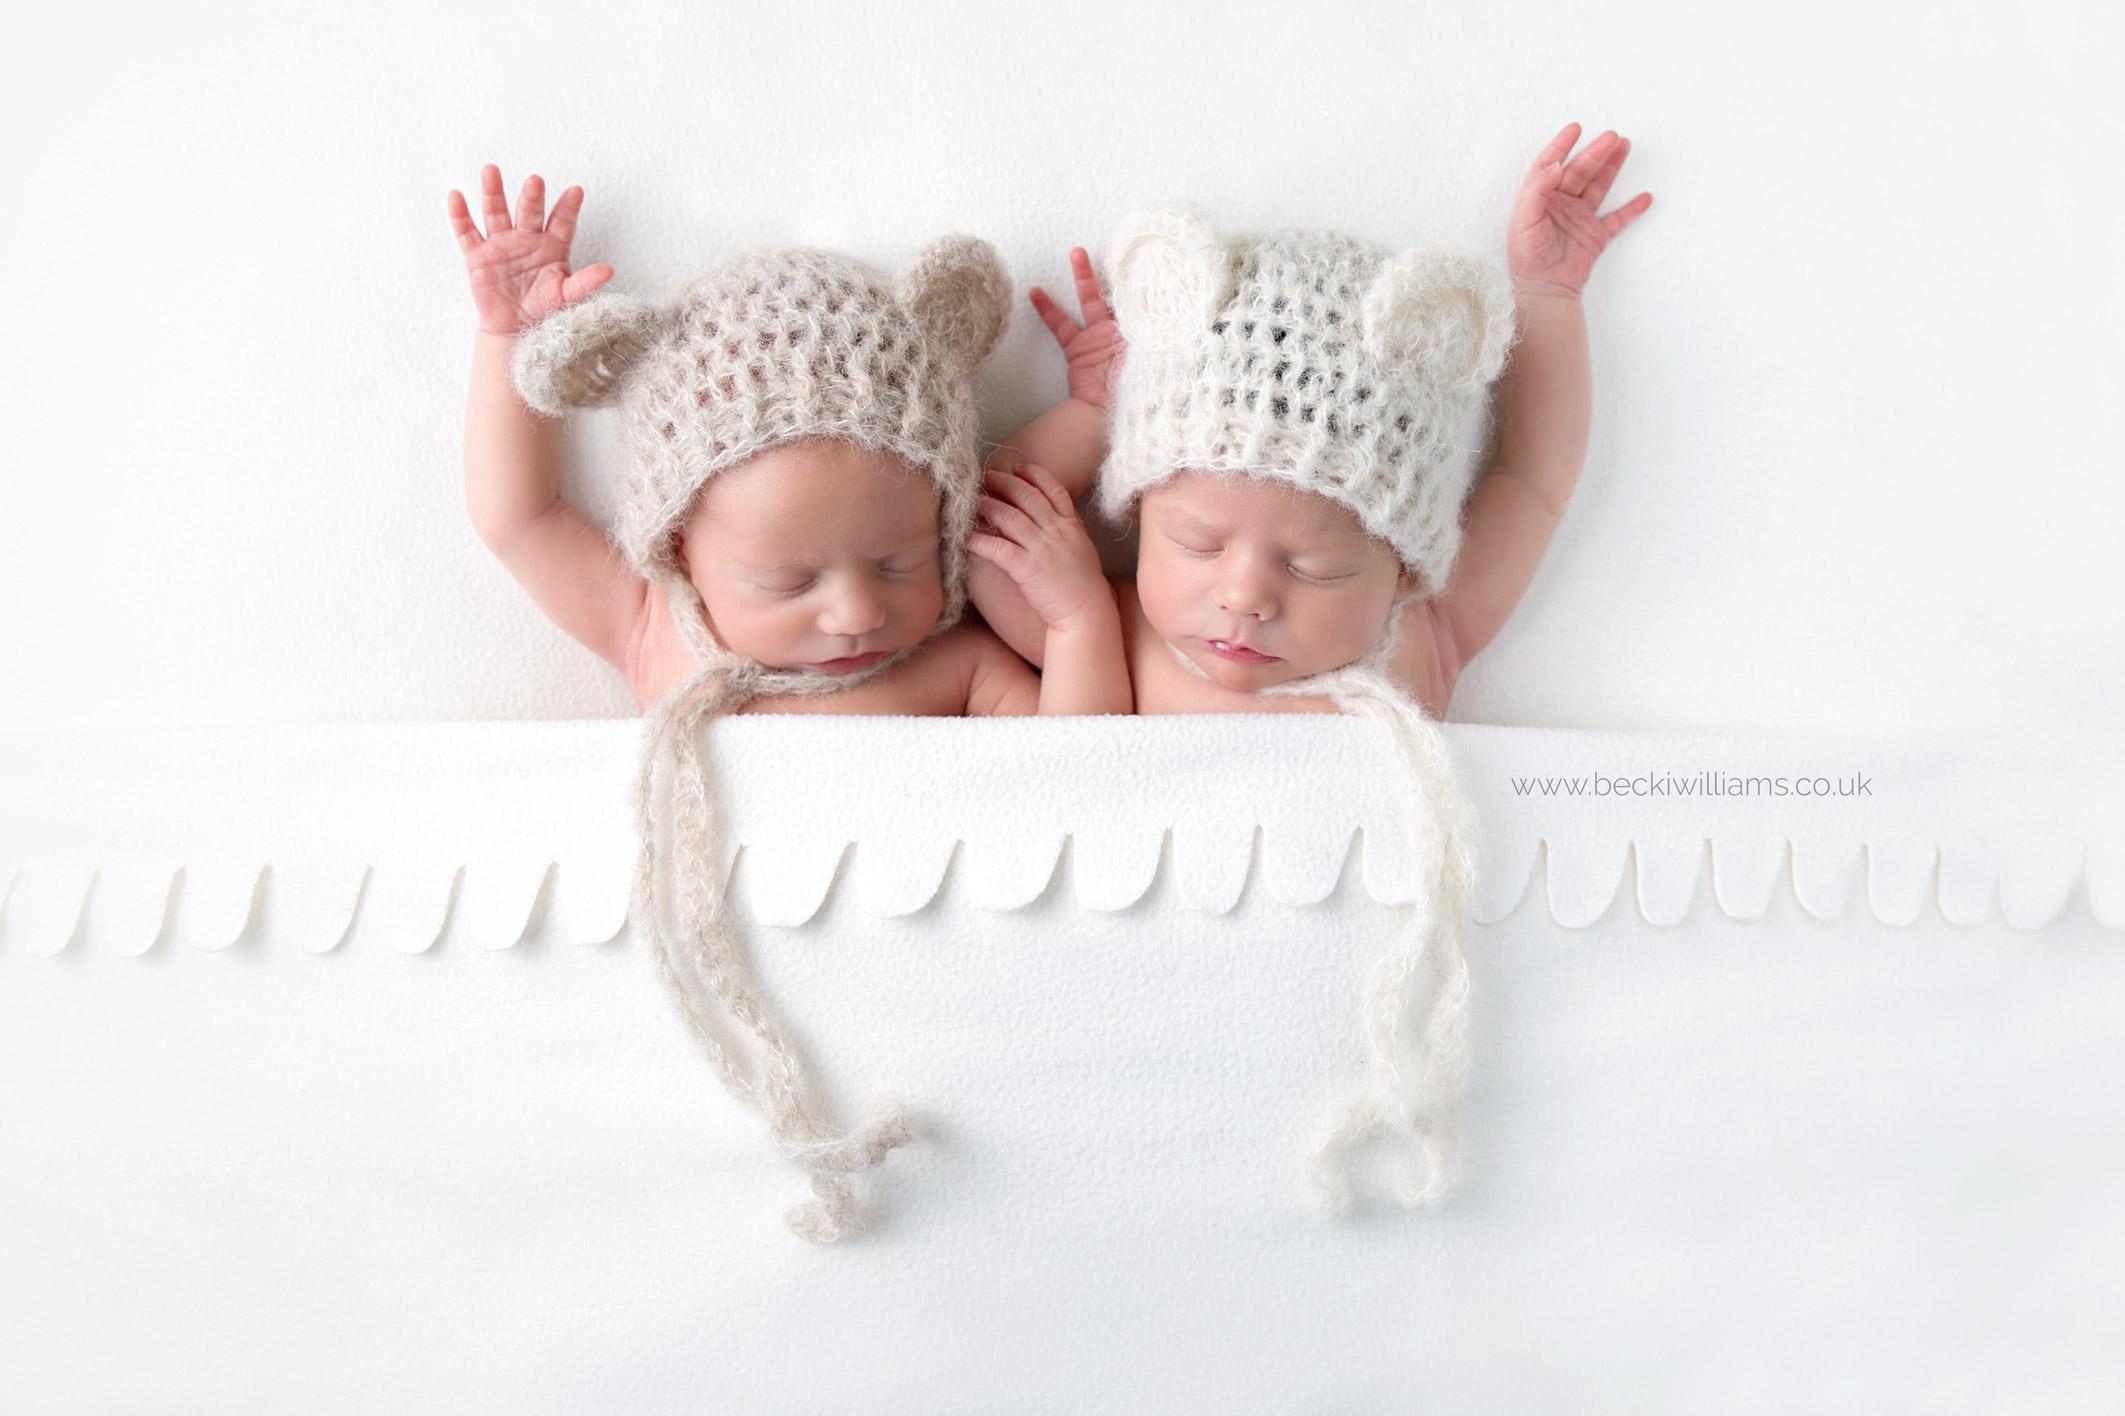 newborn baby twins lay on a white blanket in bear hats for their newborn baby photo shoot in hemel hempstead